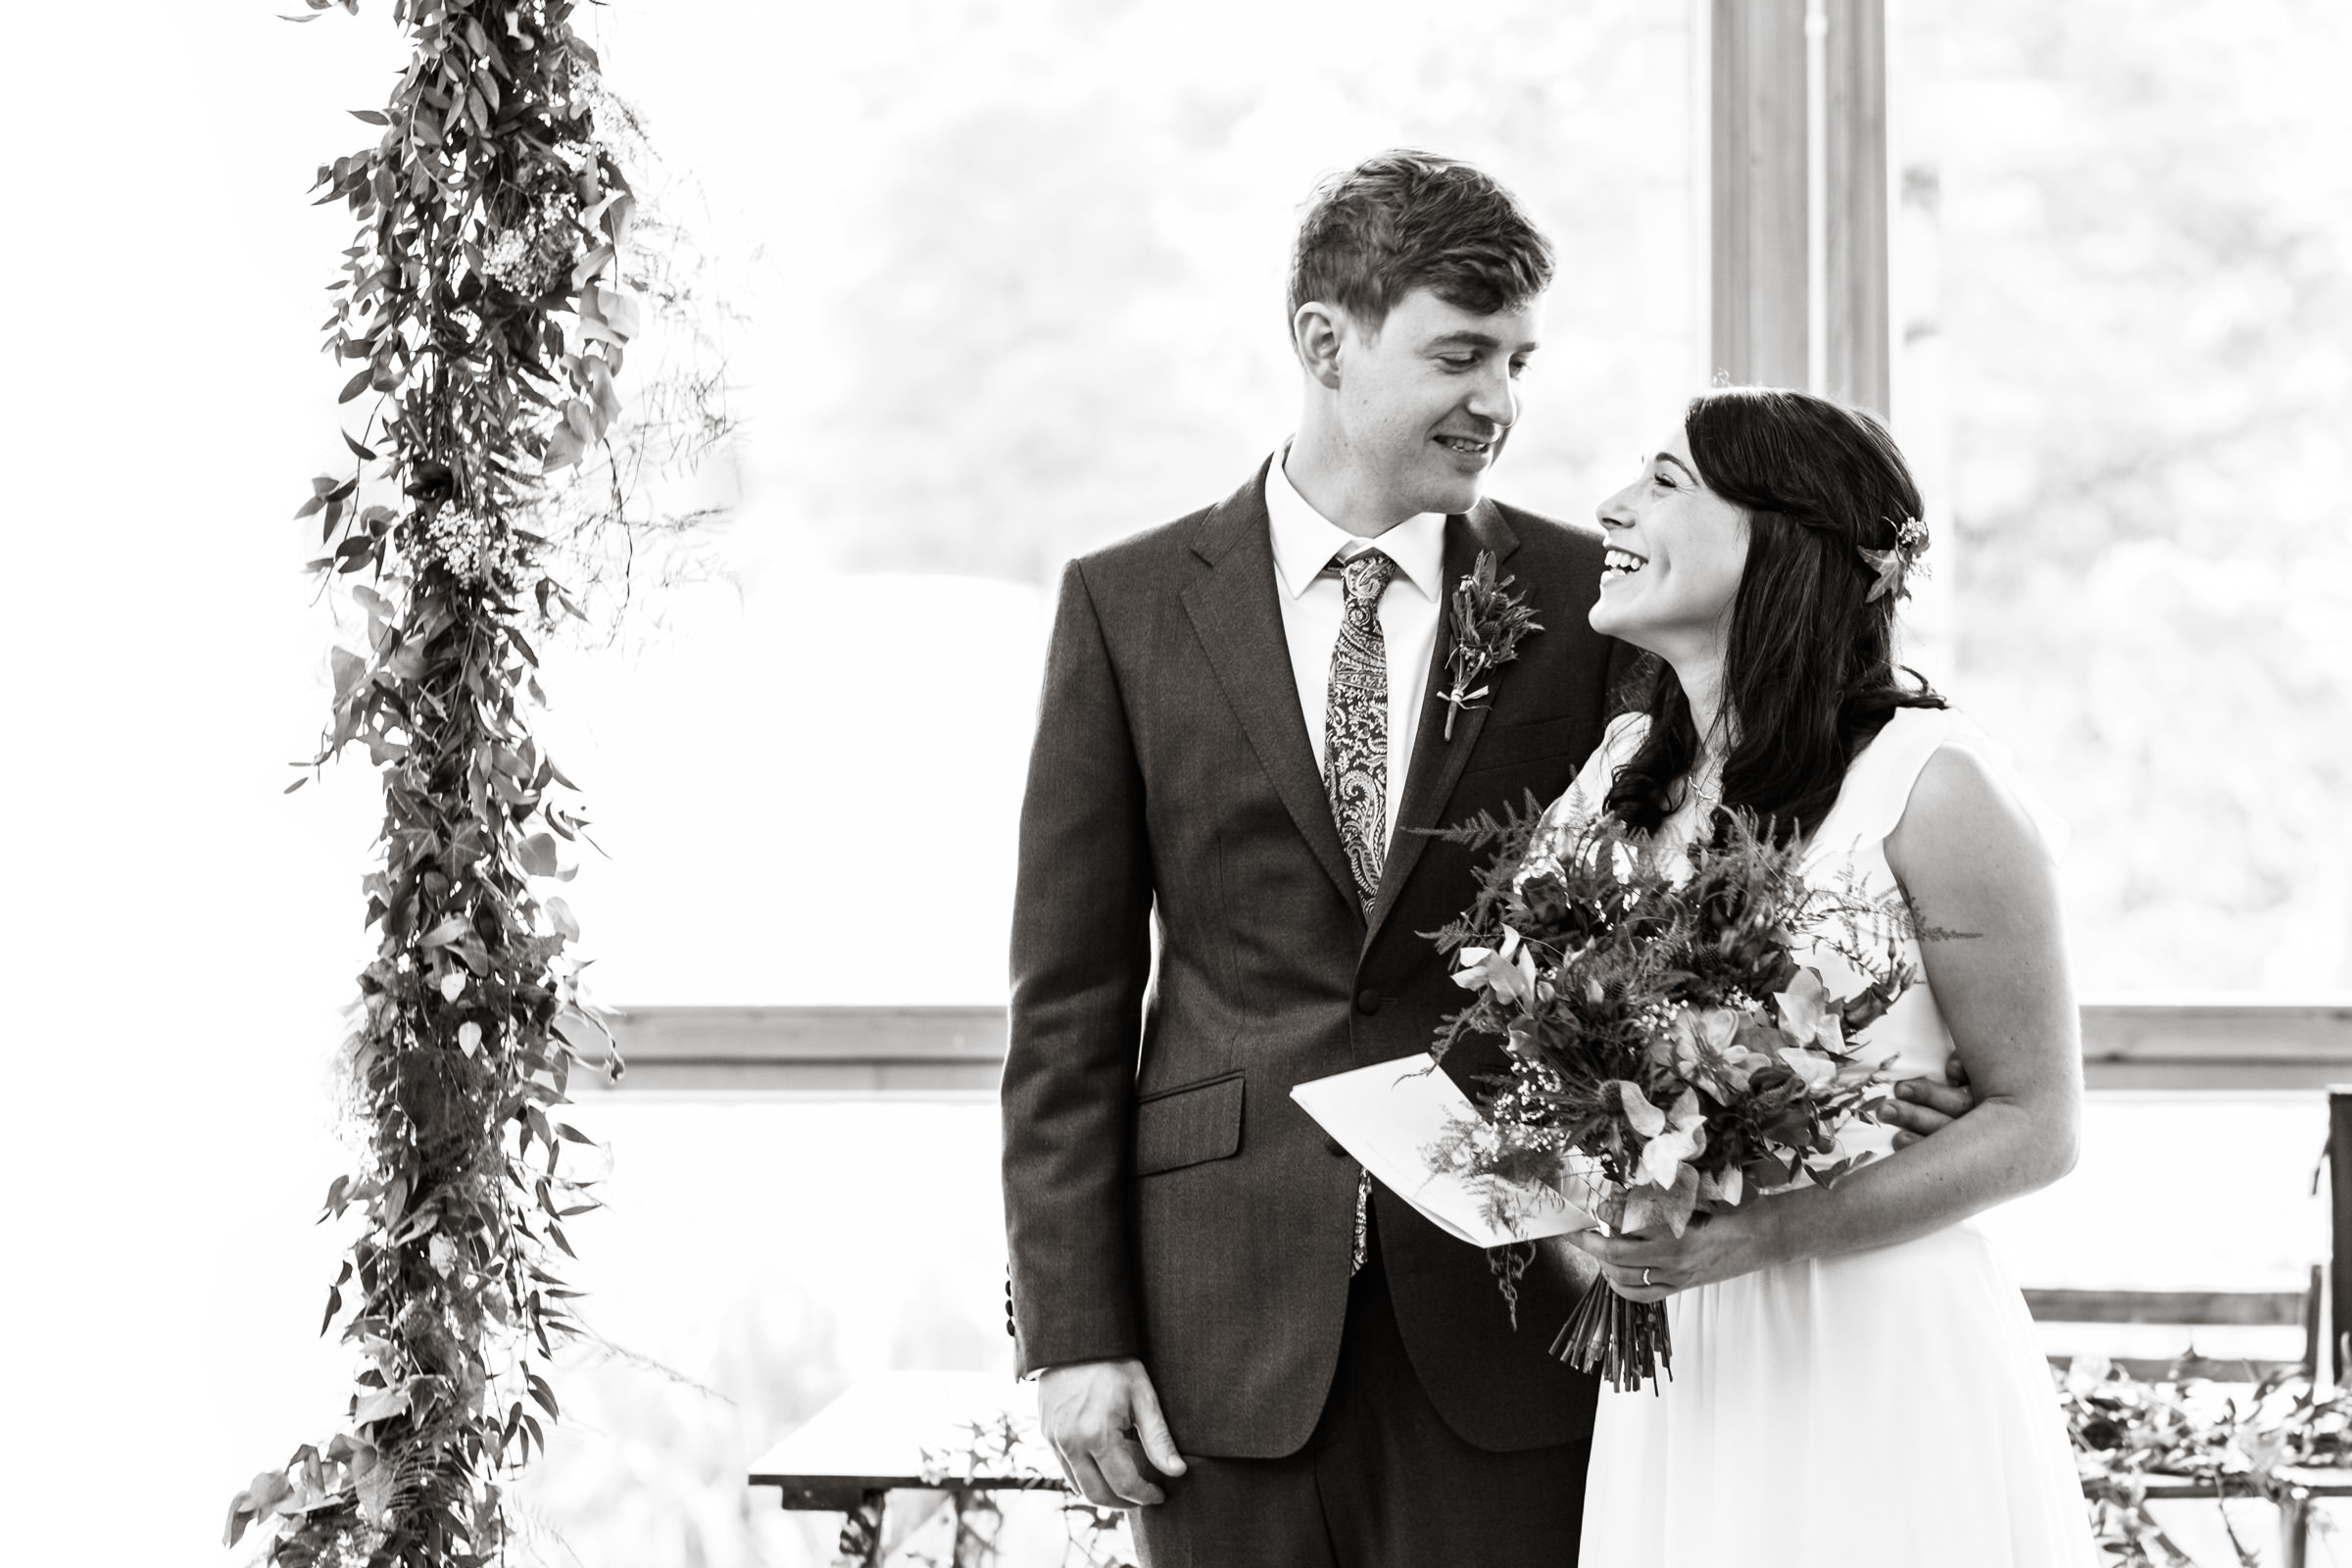 Wedding+Photography+At+The+Art+Pavilion+Mile+End+005.jpg